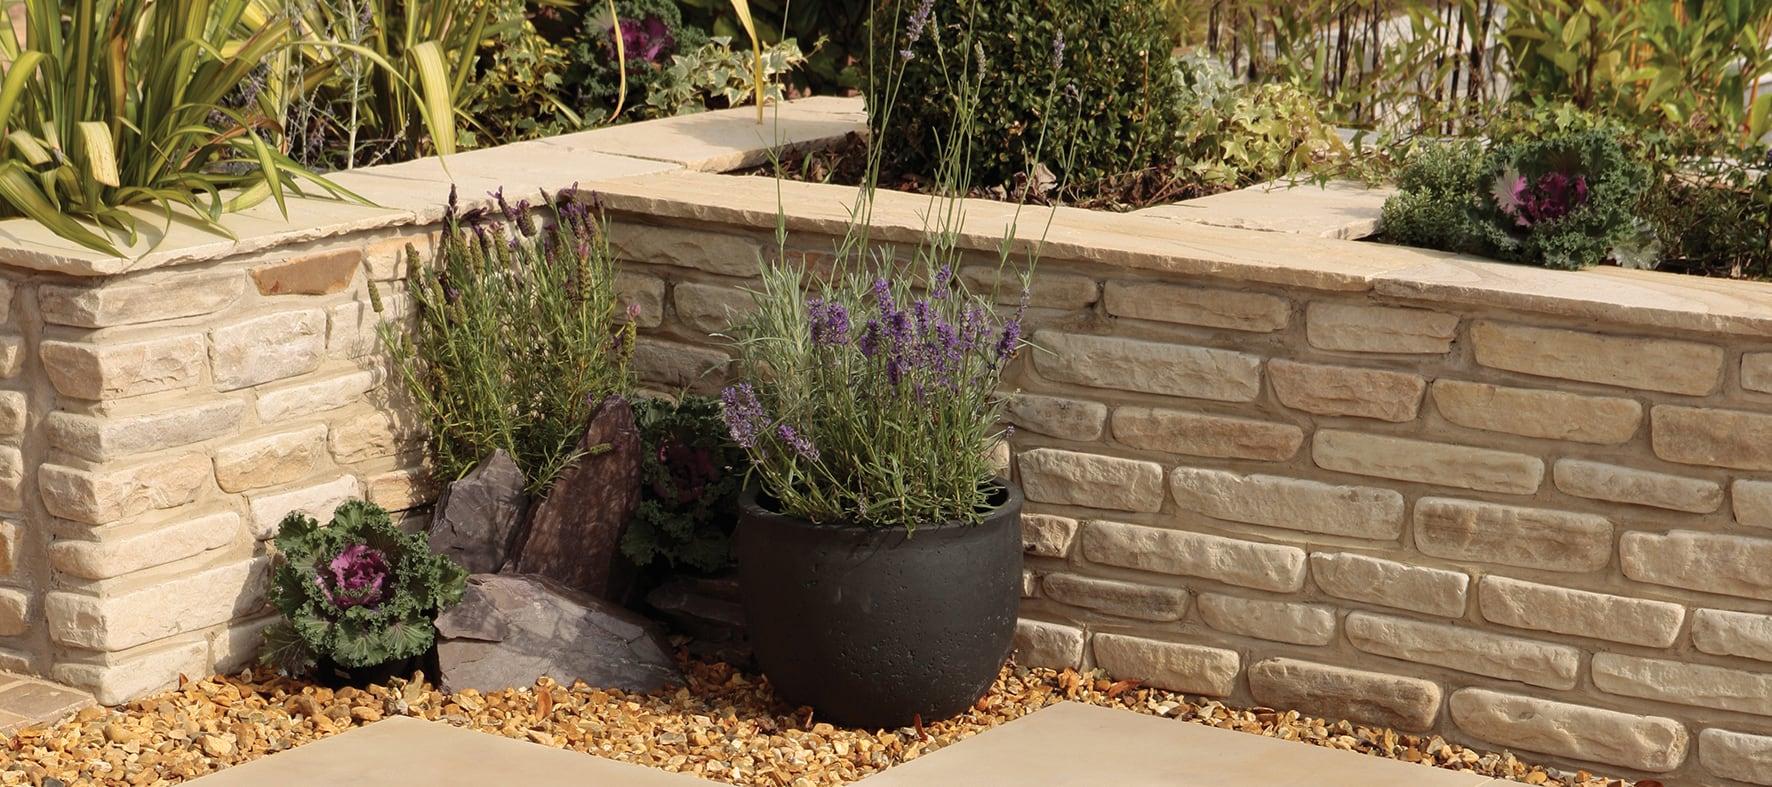 How to lay bricks for a garden wall - Frank Key